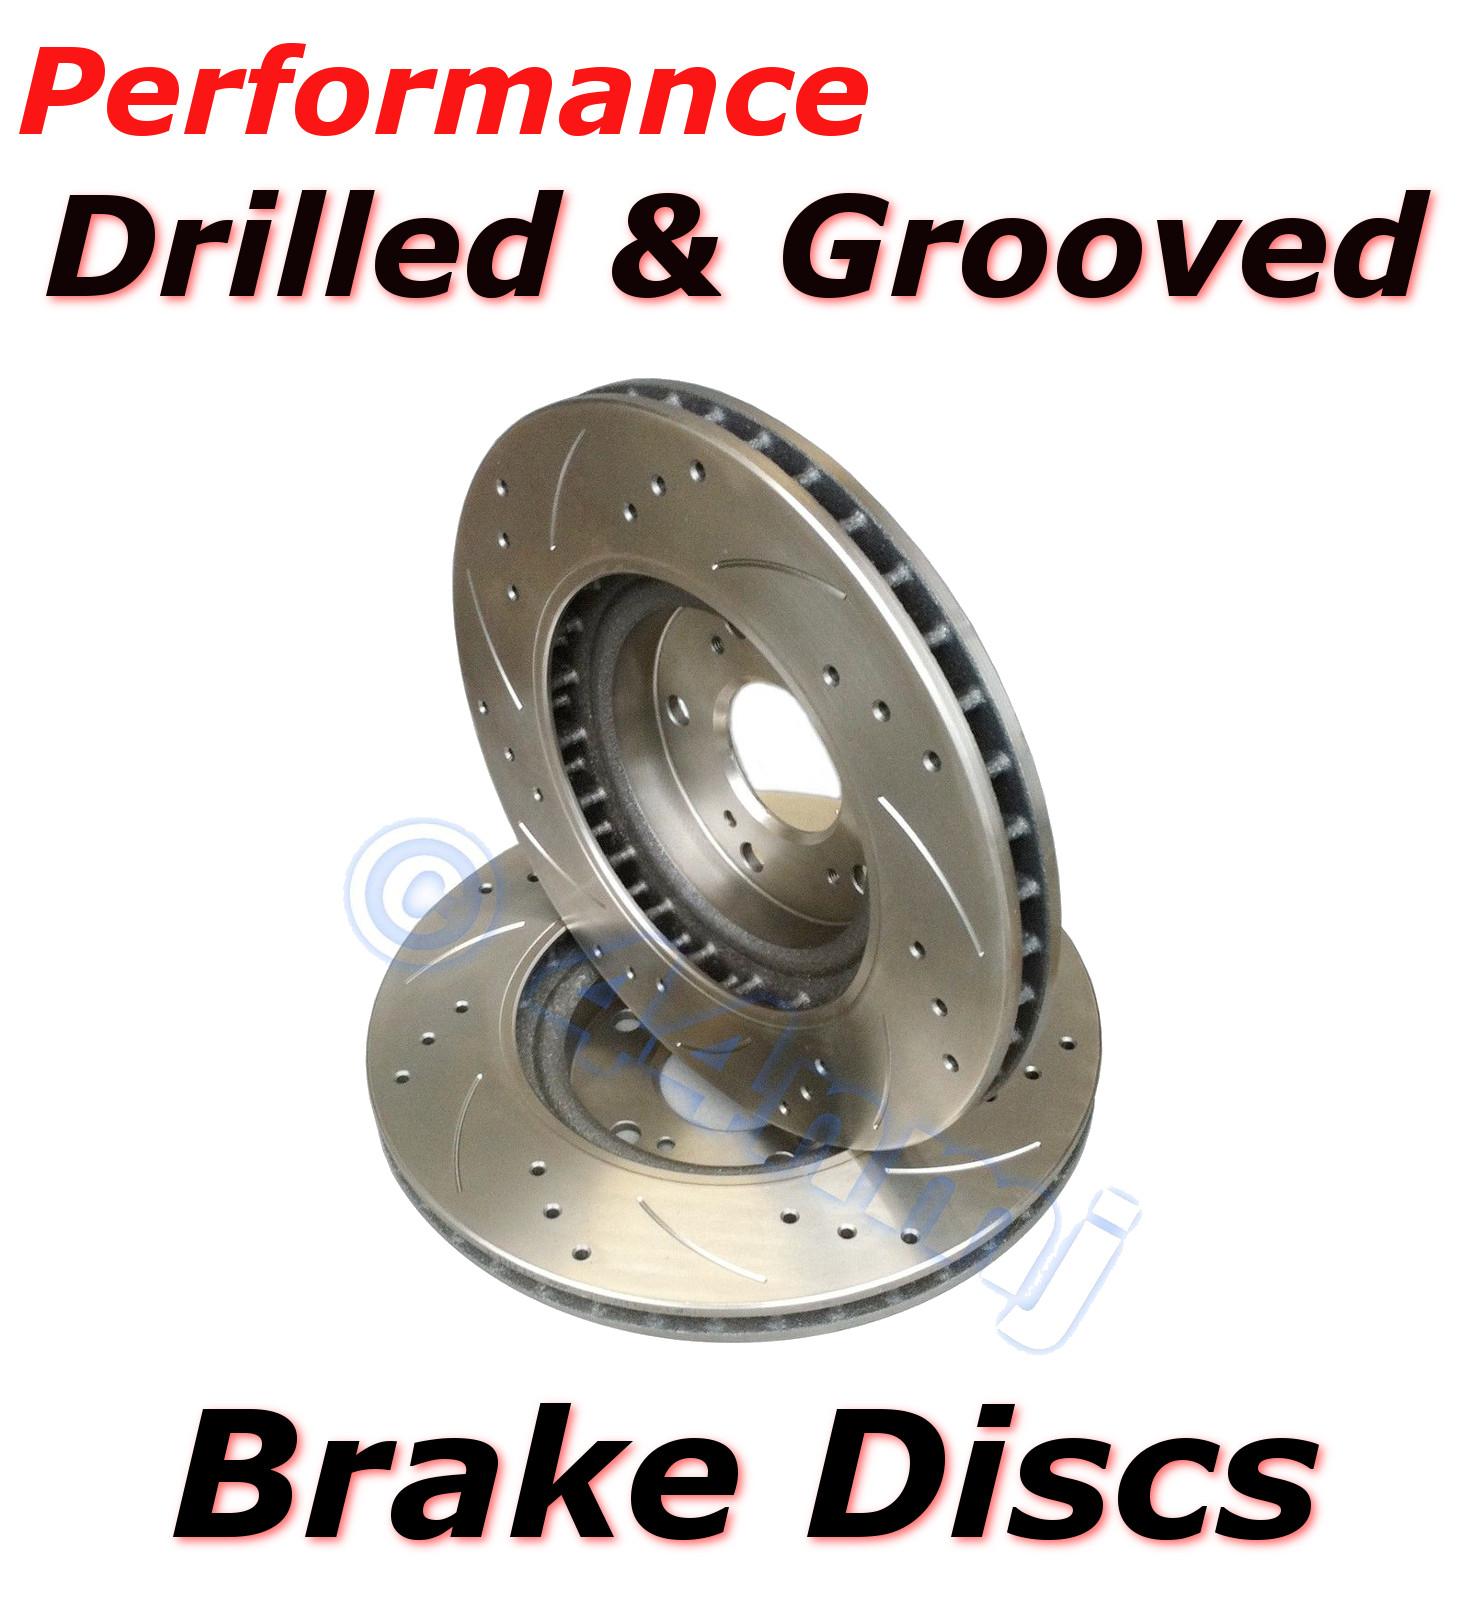 performance upgrade drilled grooved front brake discs to. Black Bedroom Furniture Sets. Home Design Ideas